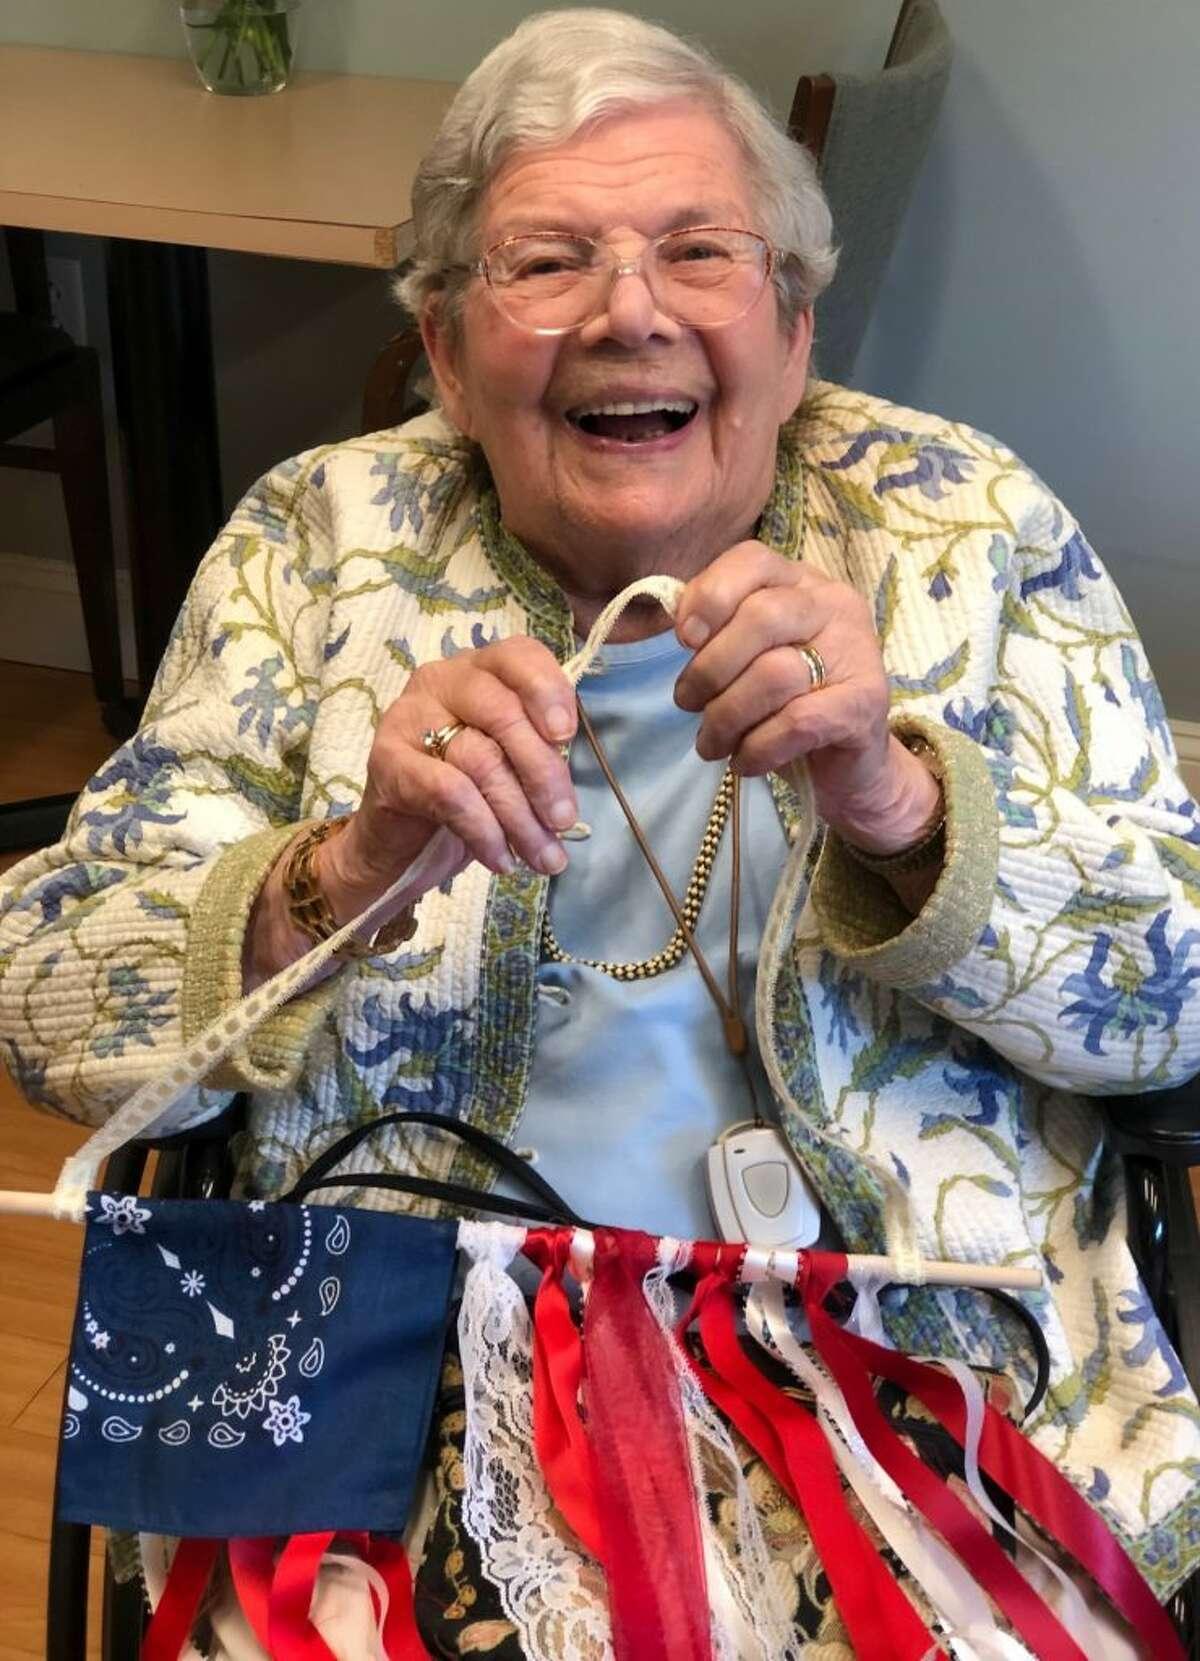 Eileen Johnson making a flag for Memorial Day.